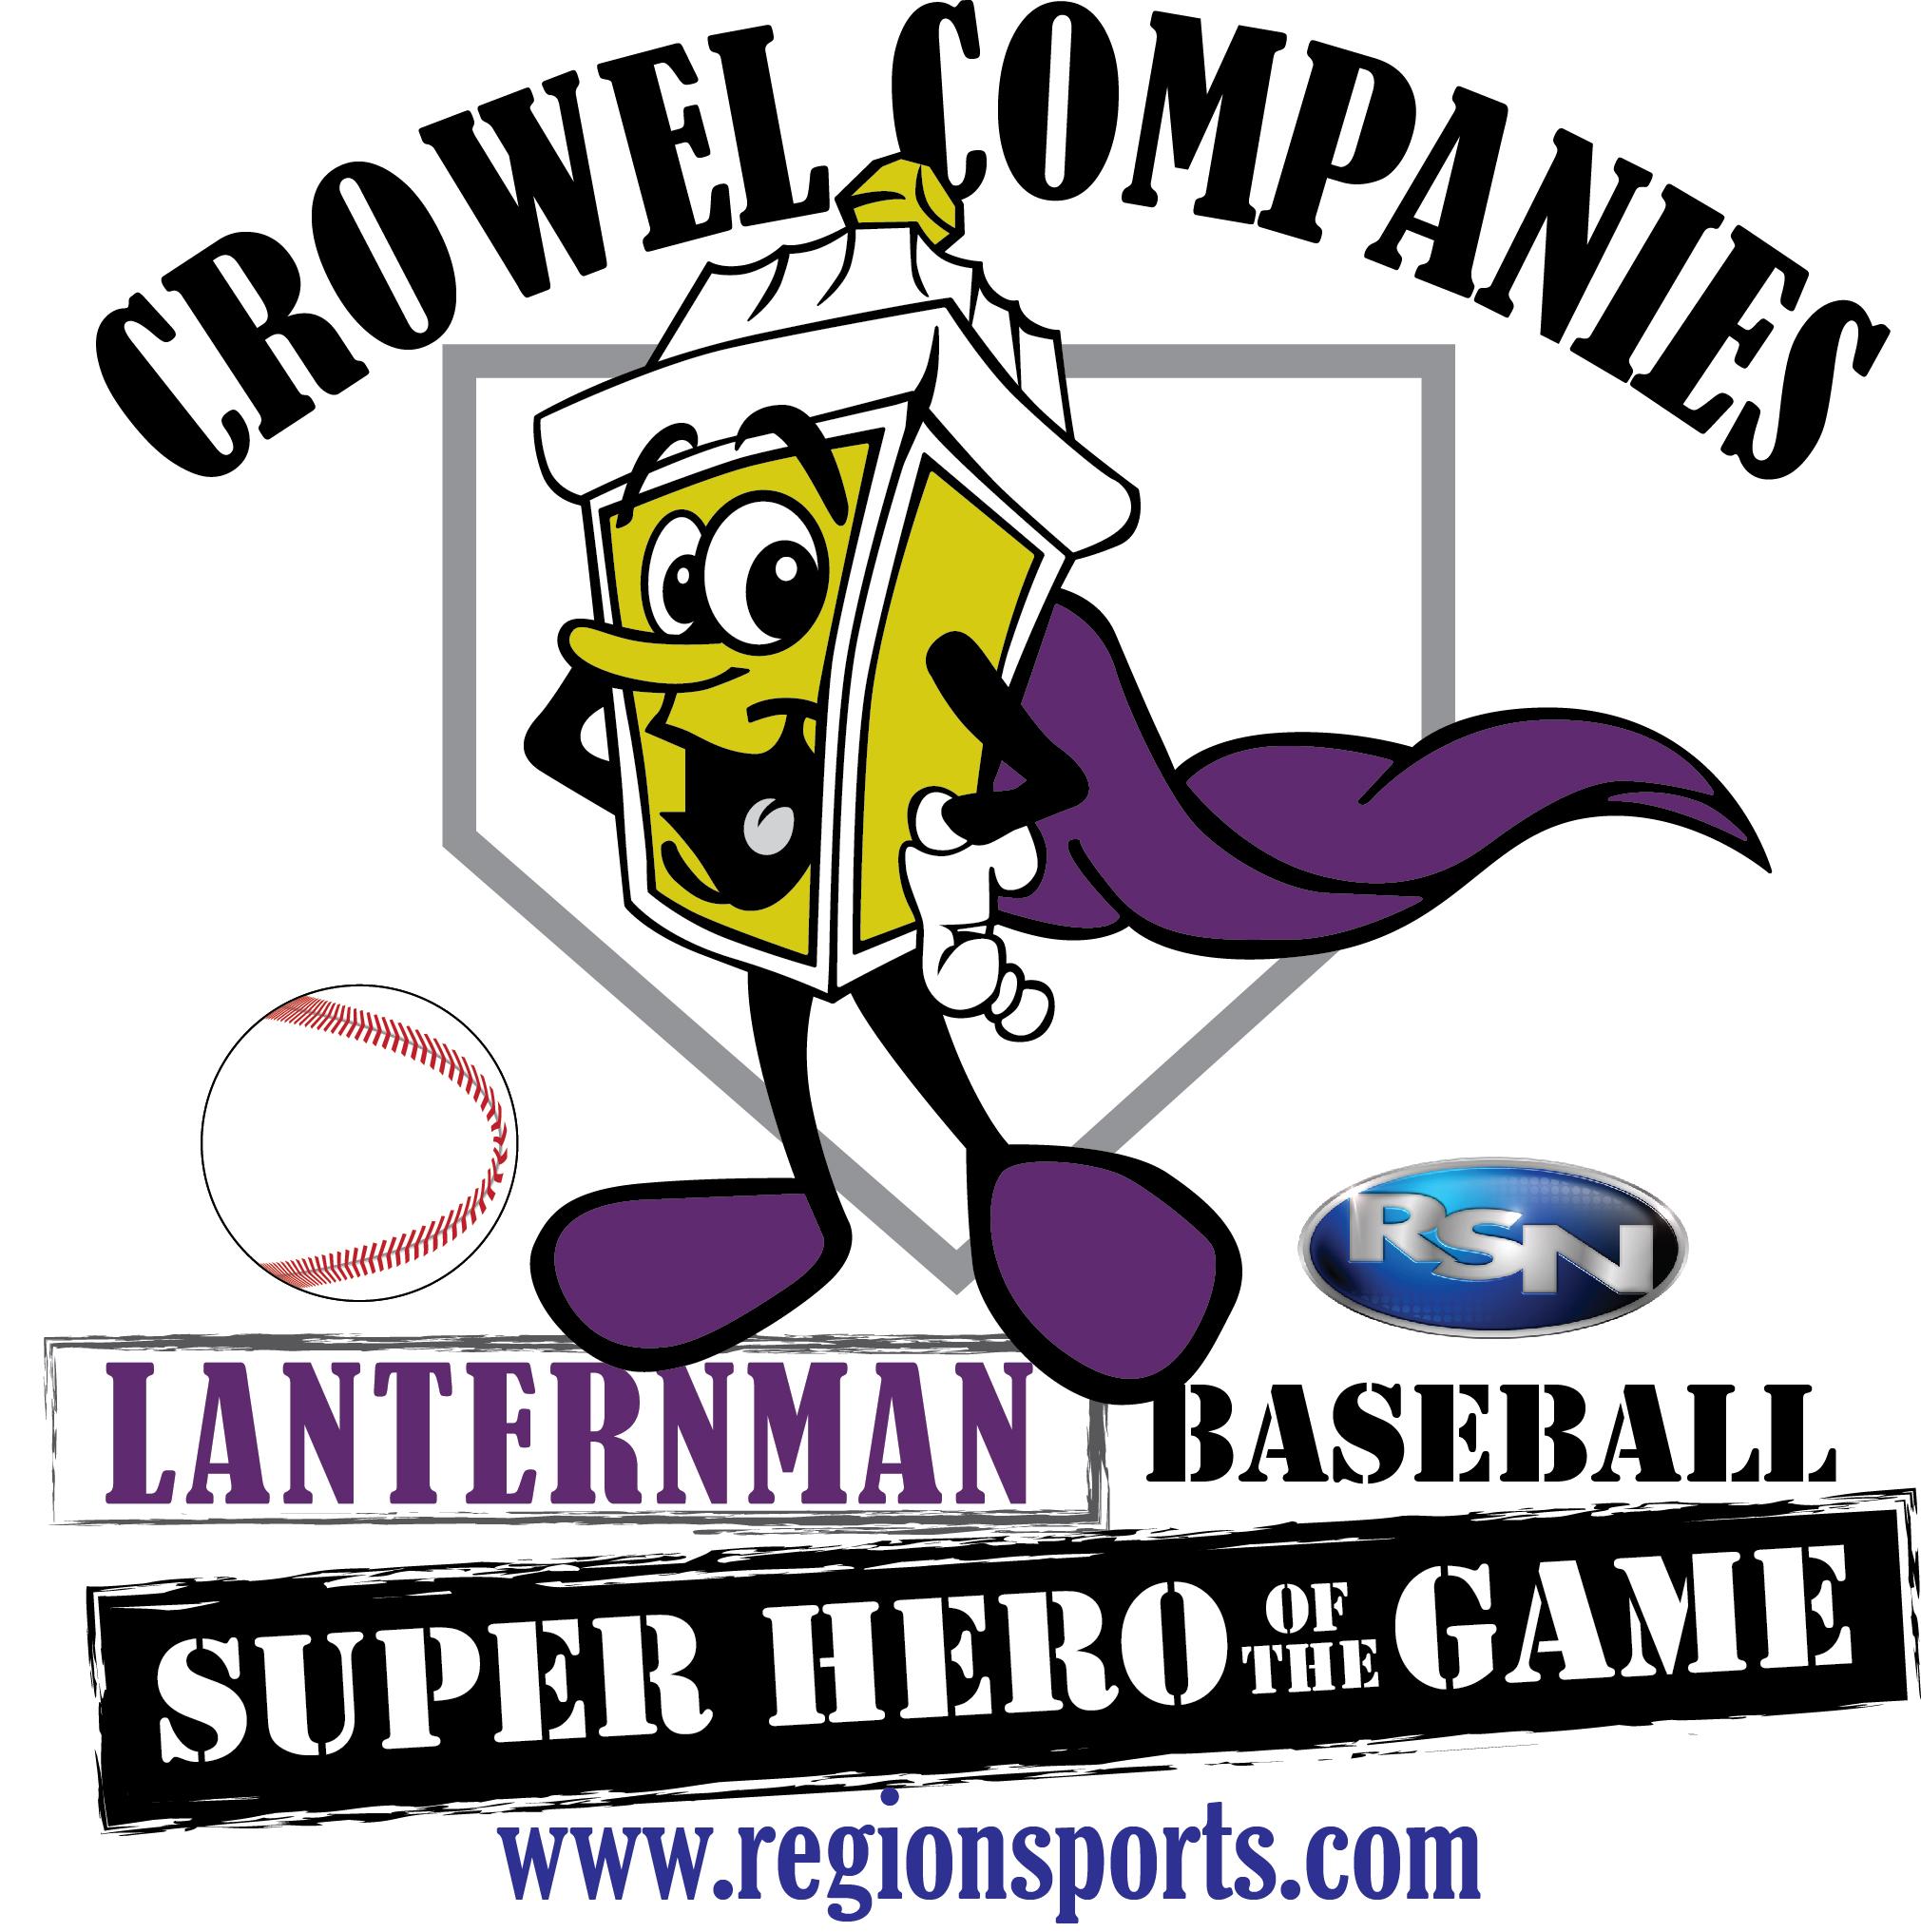 BASEBALL: Crowel Companies Lanternman Super Heroes of the Game –